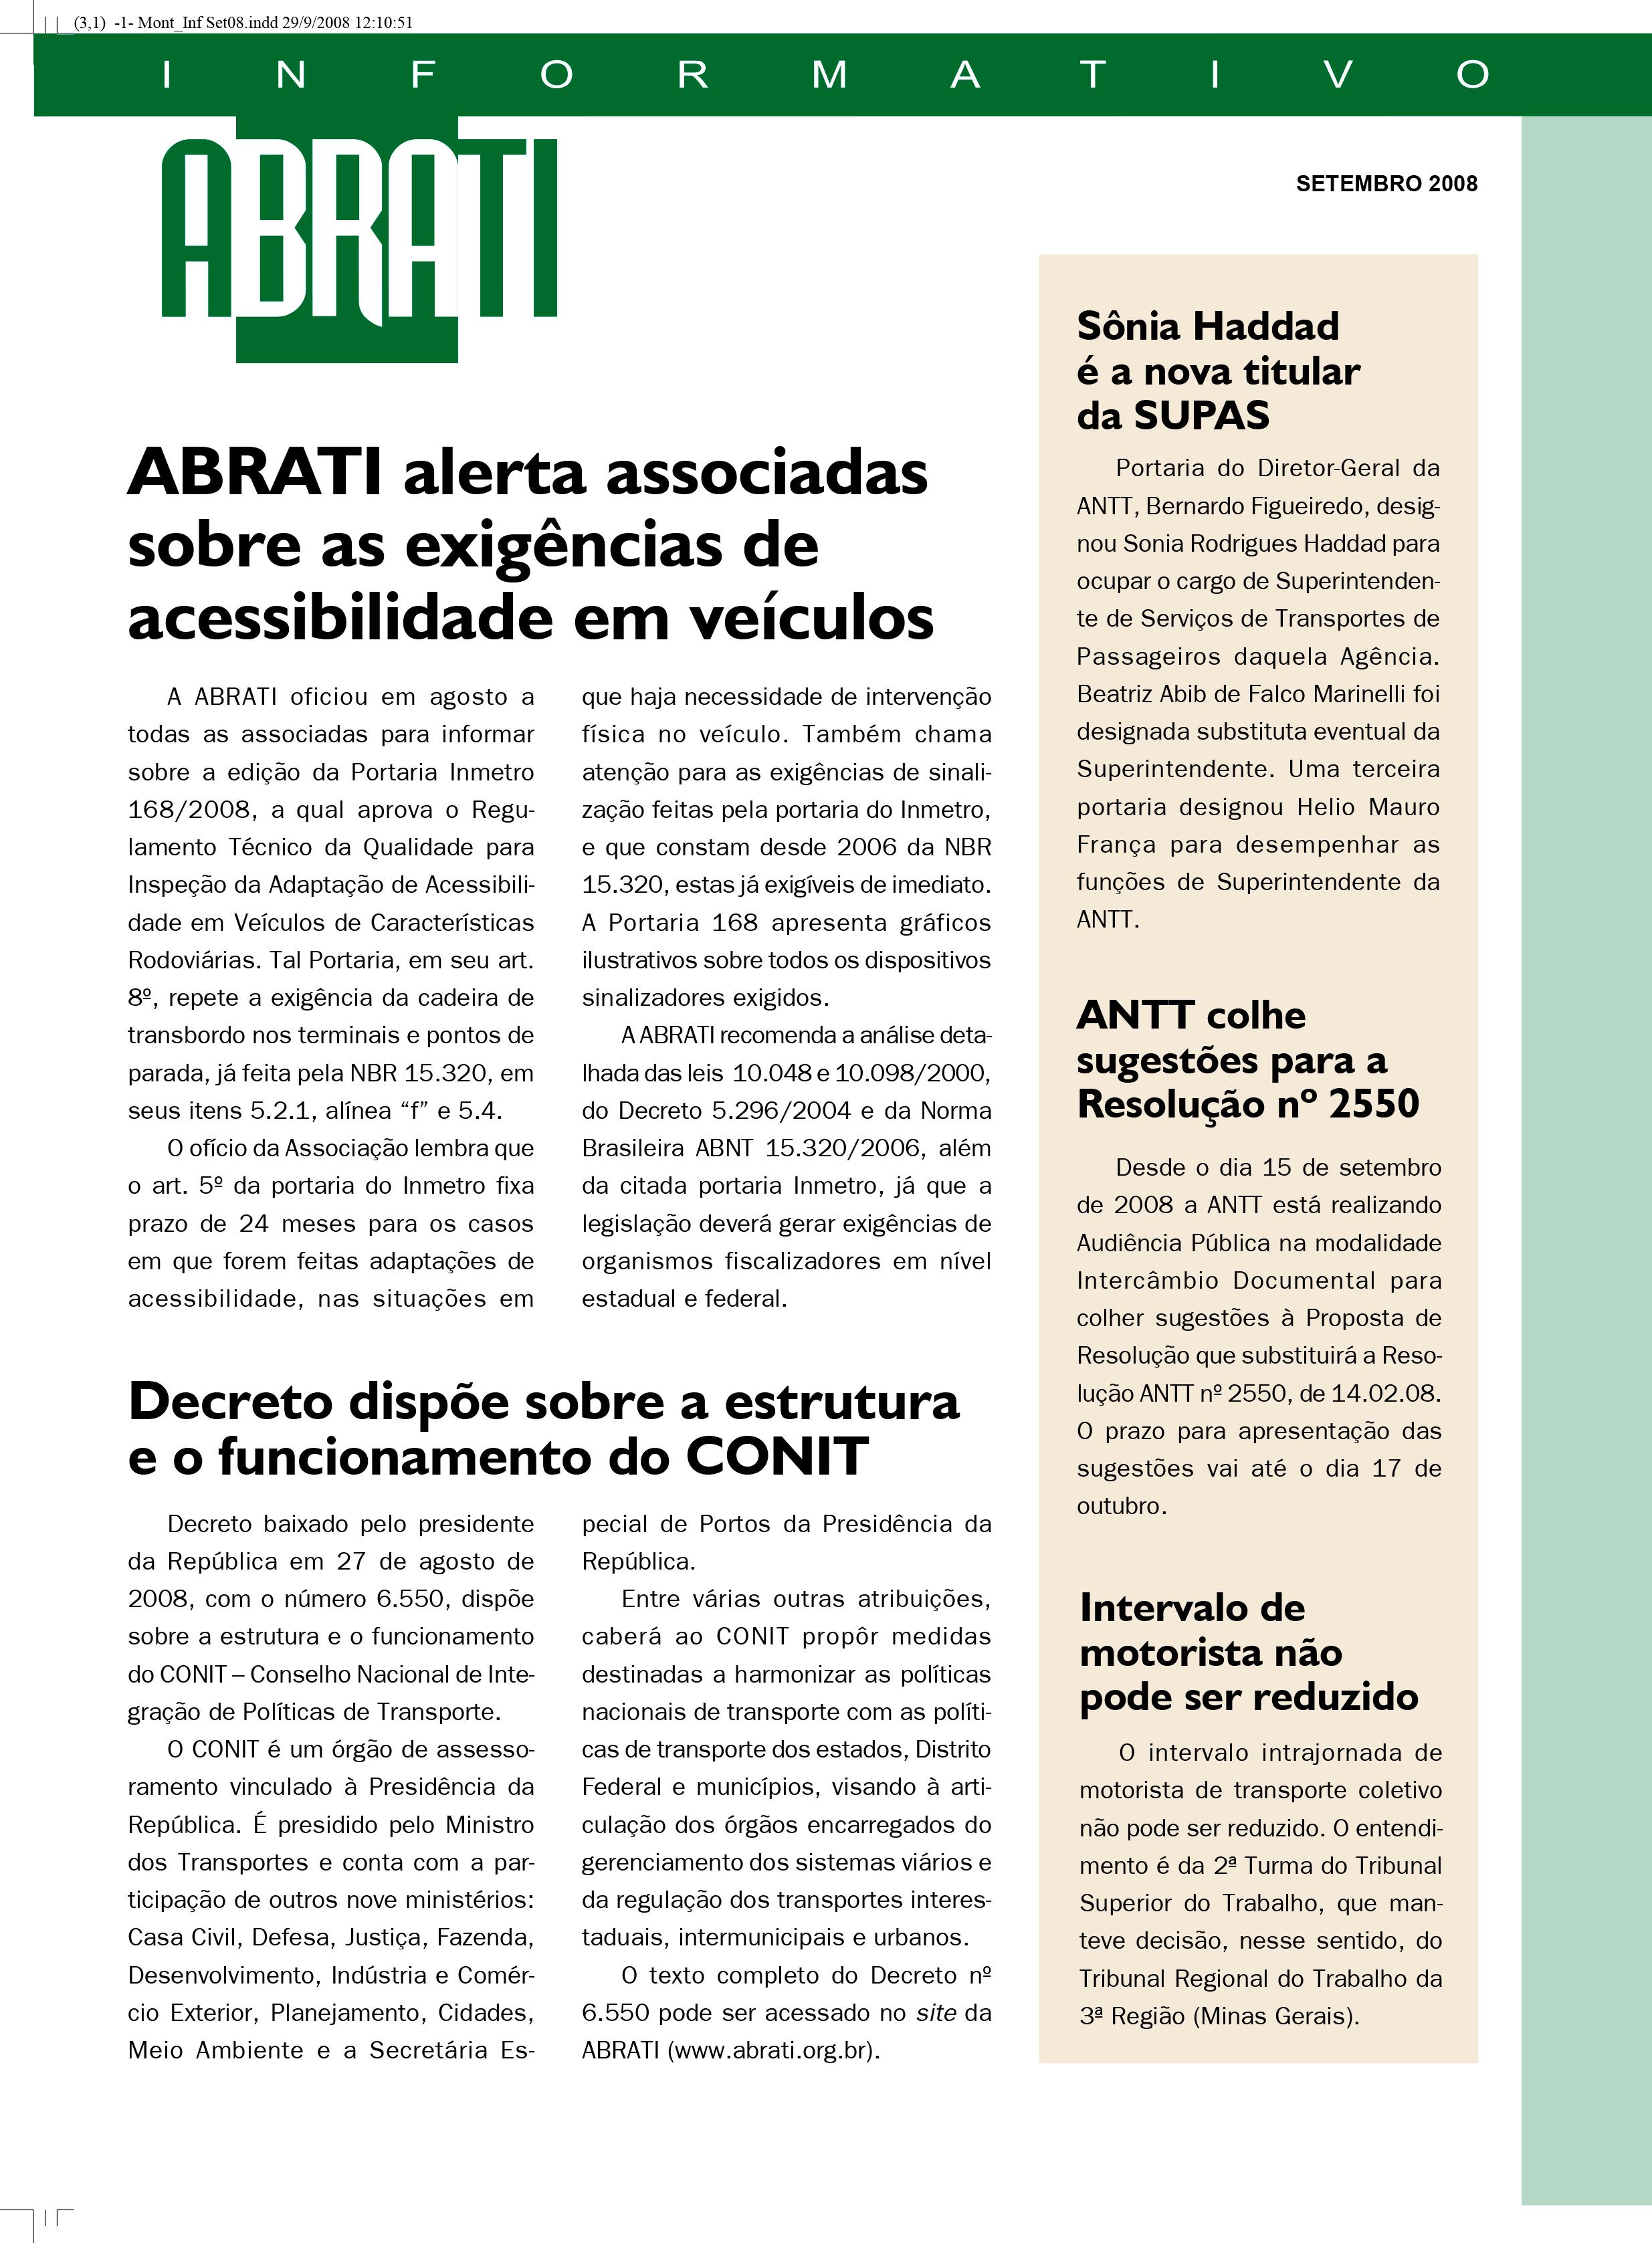 Informativo Setembro 2008